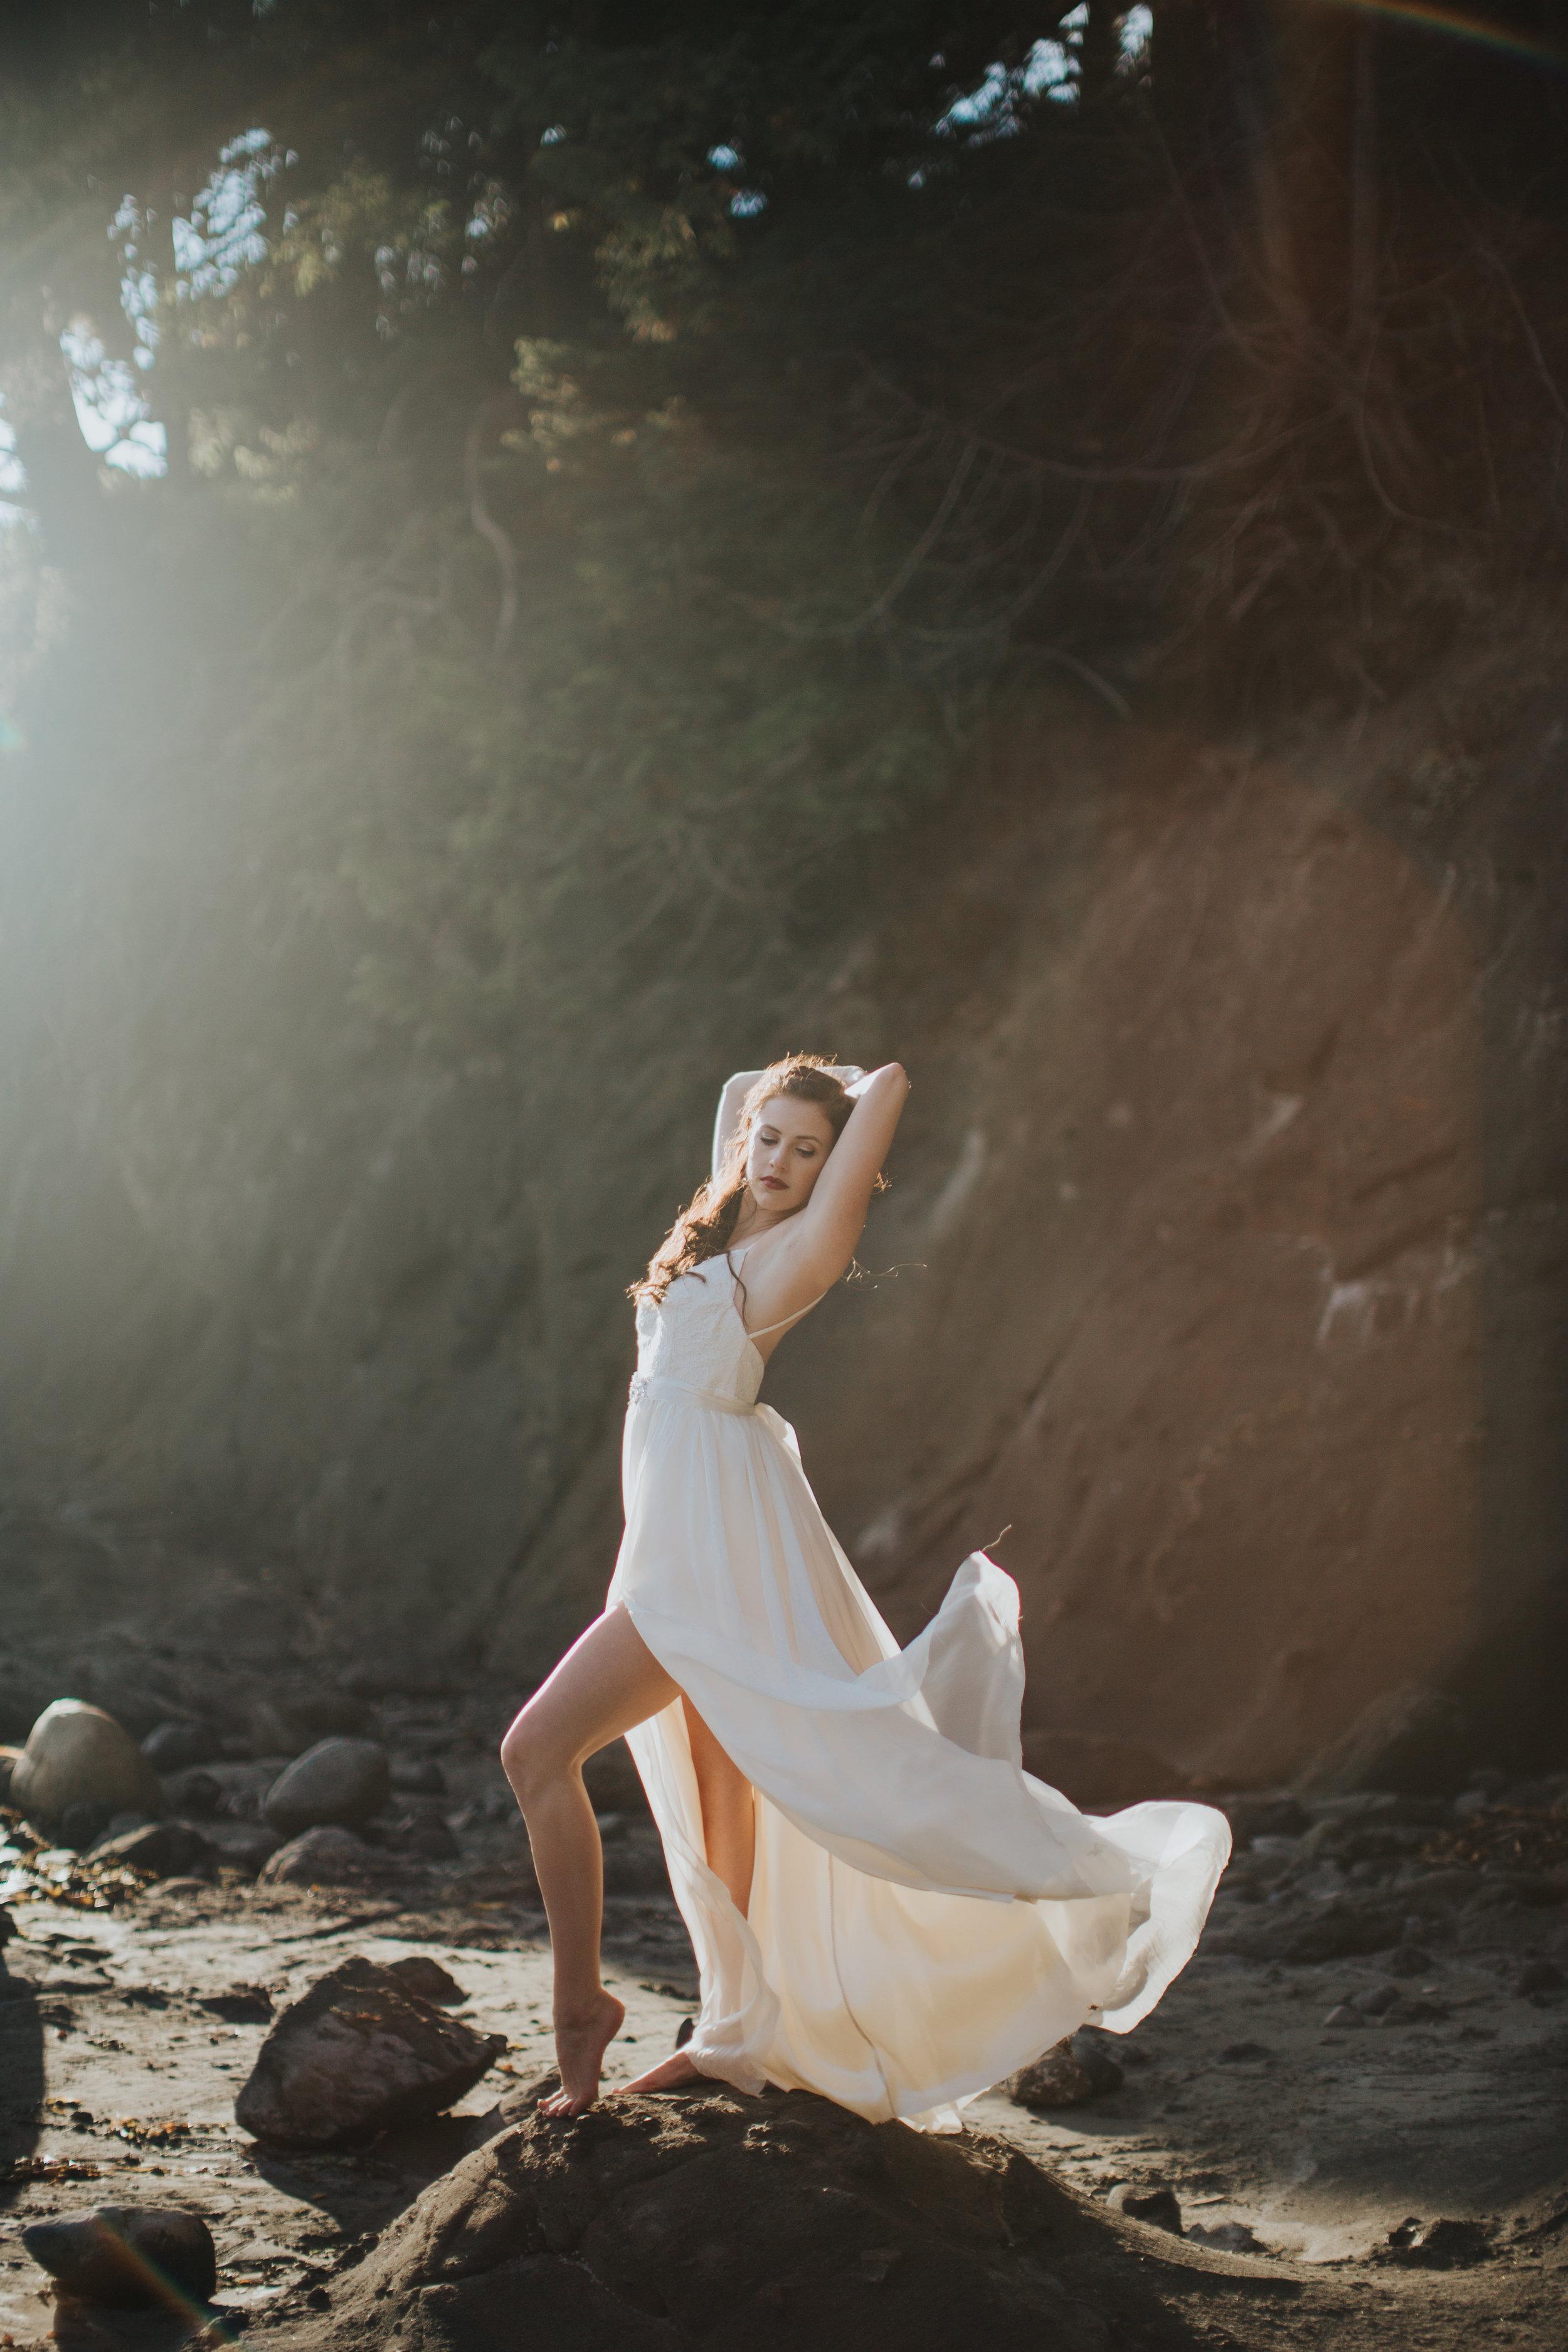 Port-Angeles-Salt-Creek-beach-wedding-bride-PNW-olympic-peninsula-photographer-Kayla-Dawn-Photography-outdoors-golden-hour-dancer-dress (13).jpg